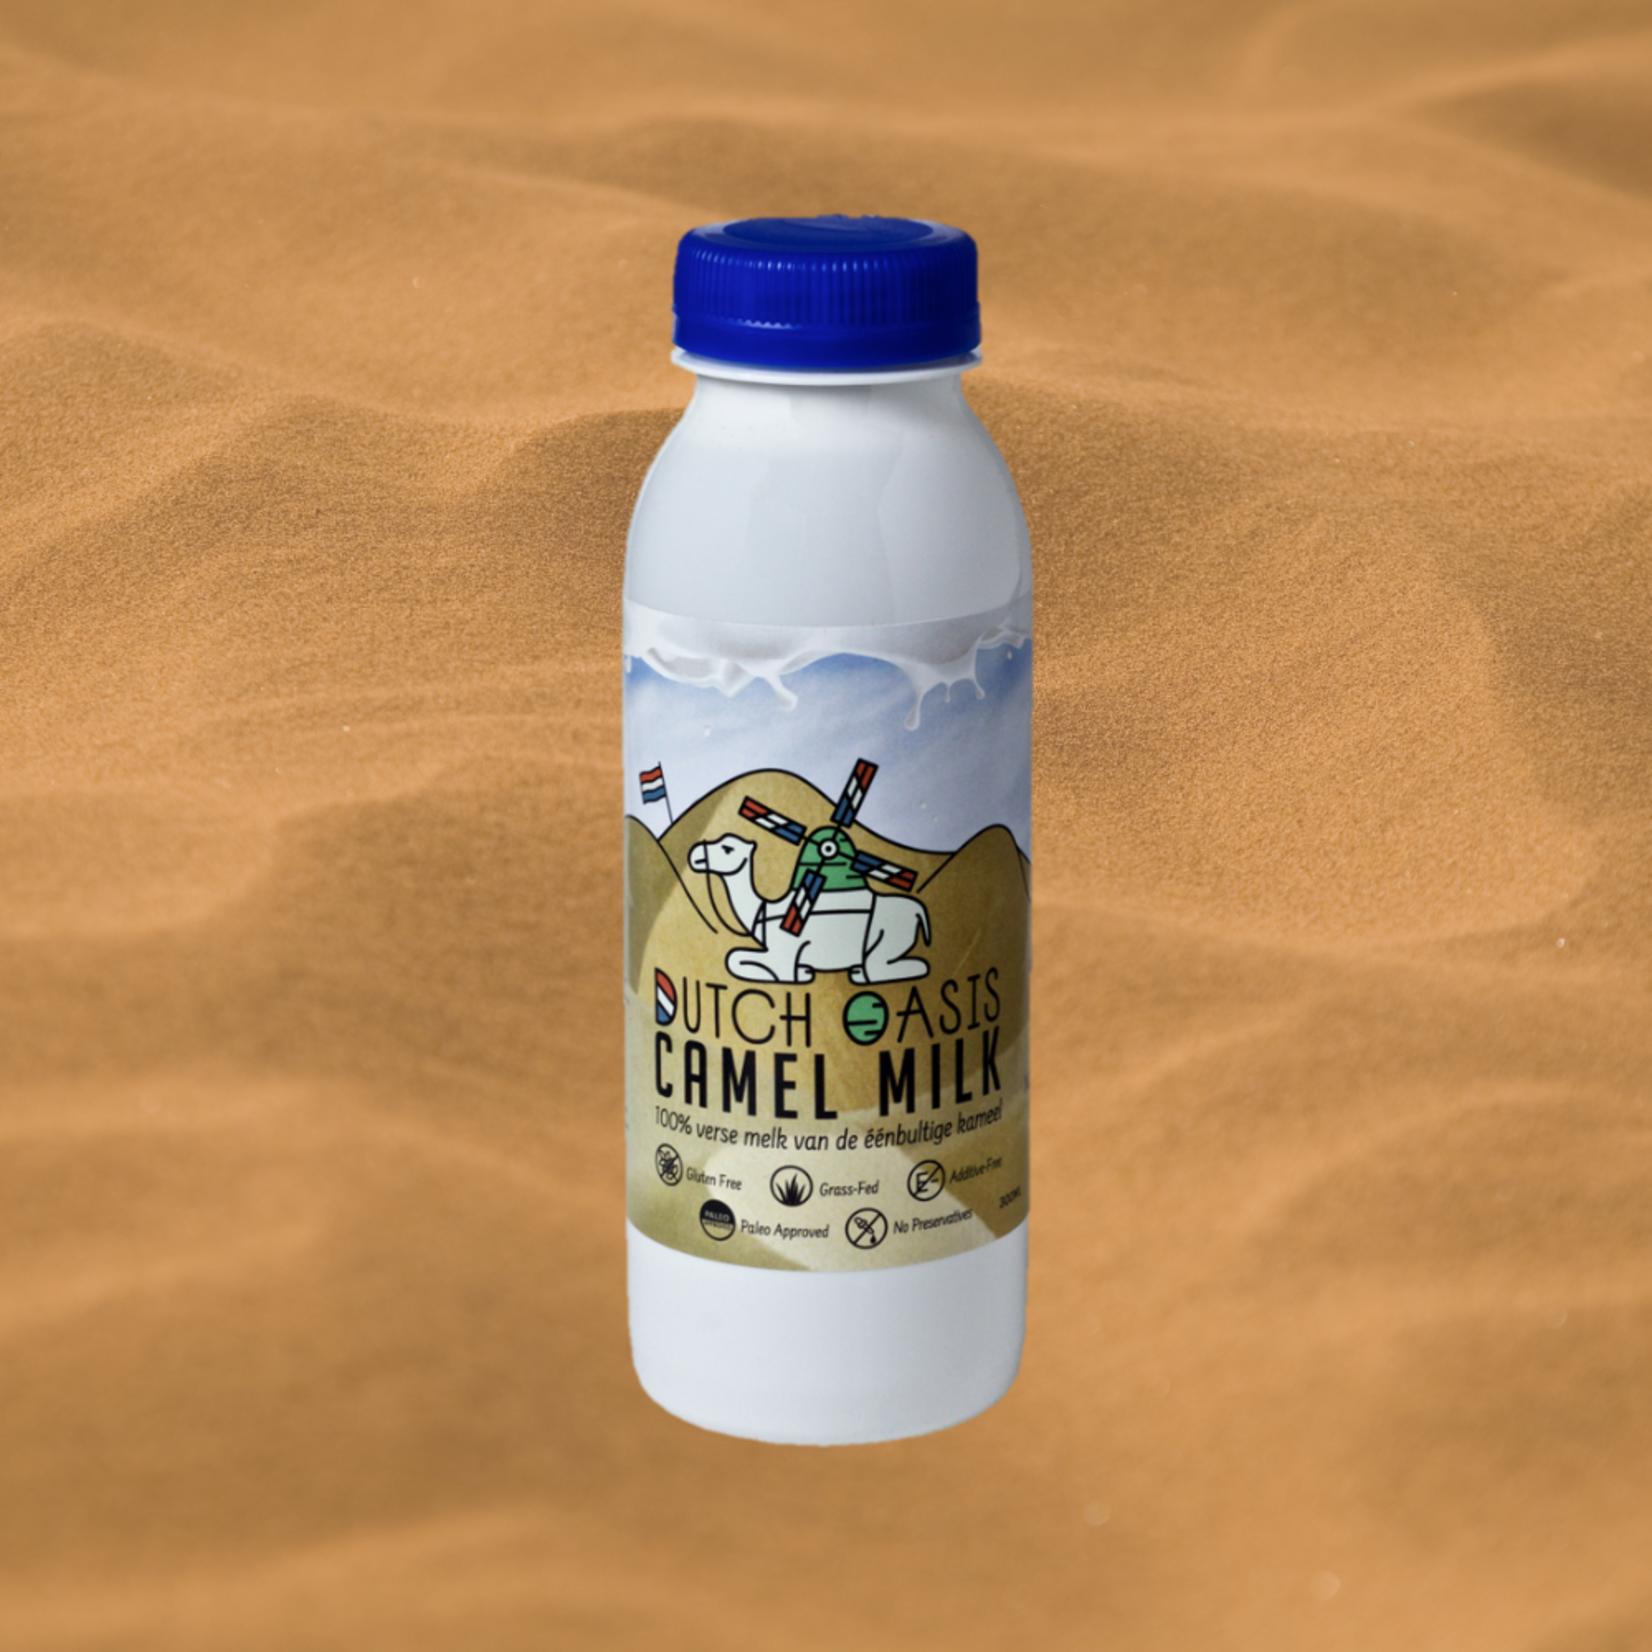 Dutch Oasis 10 bottles of 250 ml fresh raw camel milk €3,95/bottle